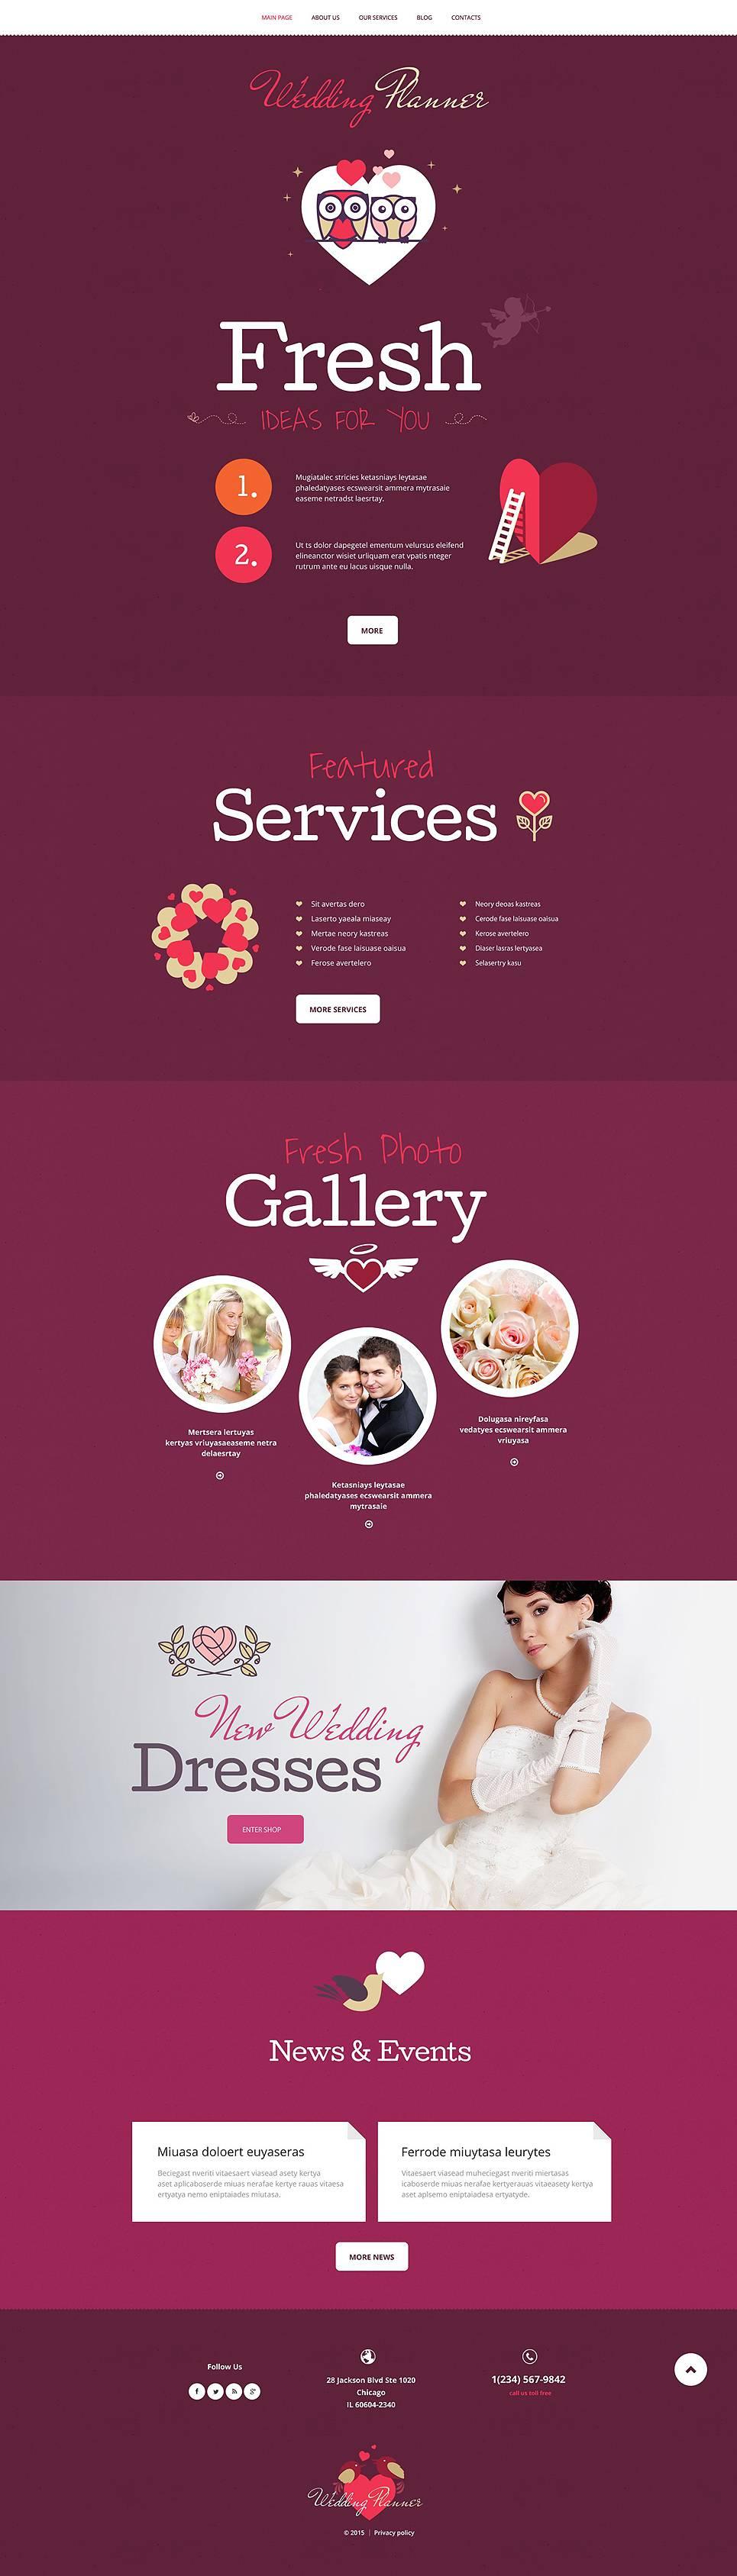 Wedding Planner Template WordPress